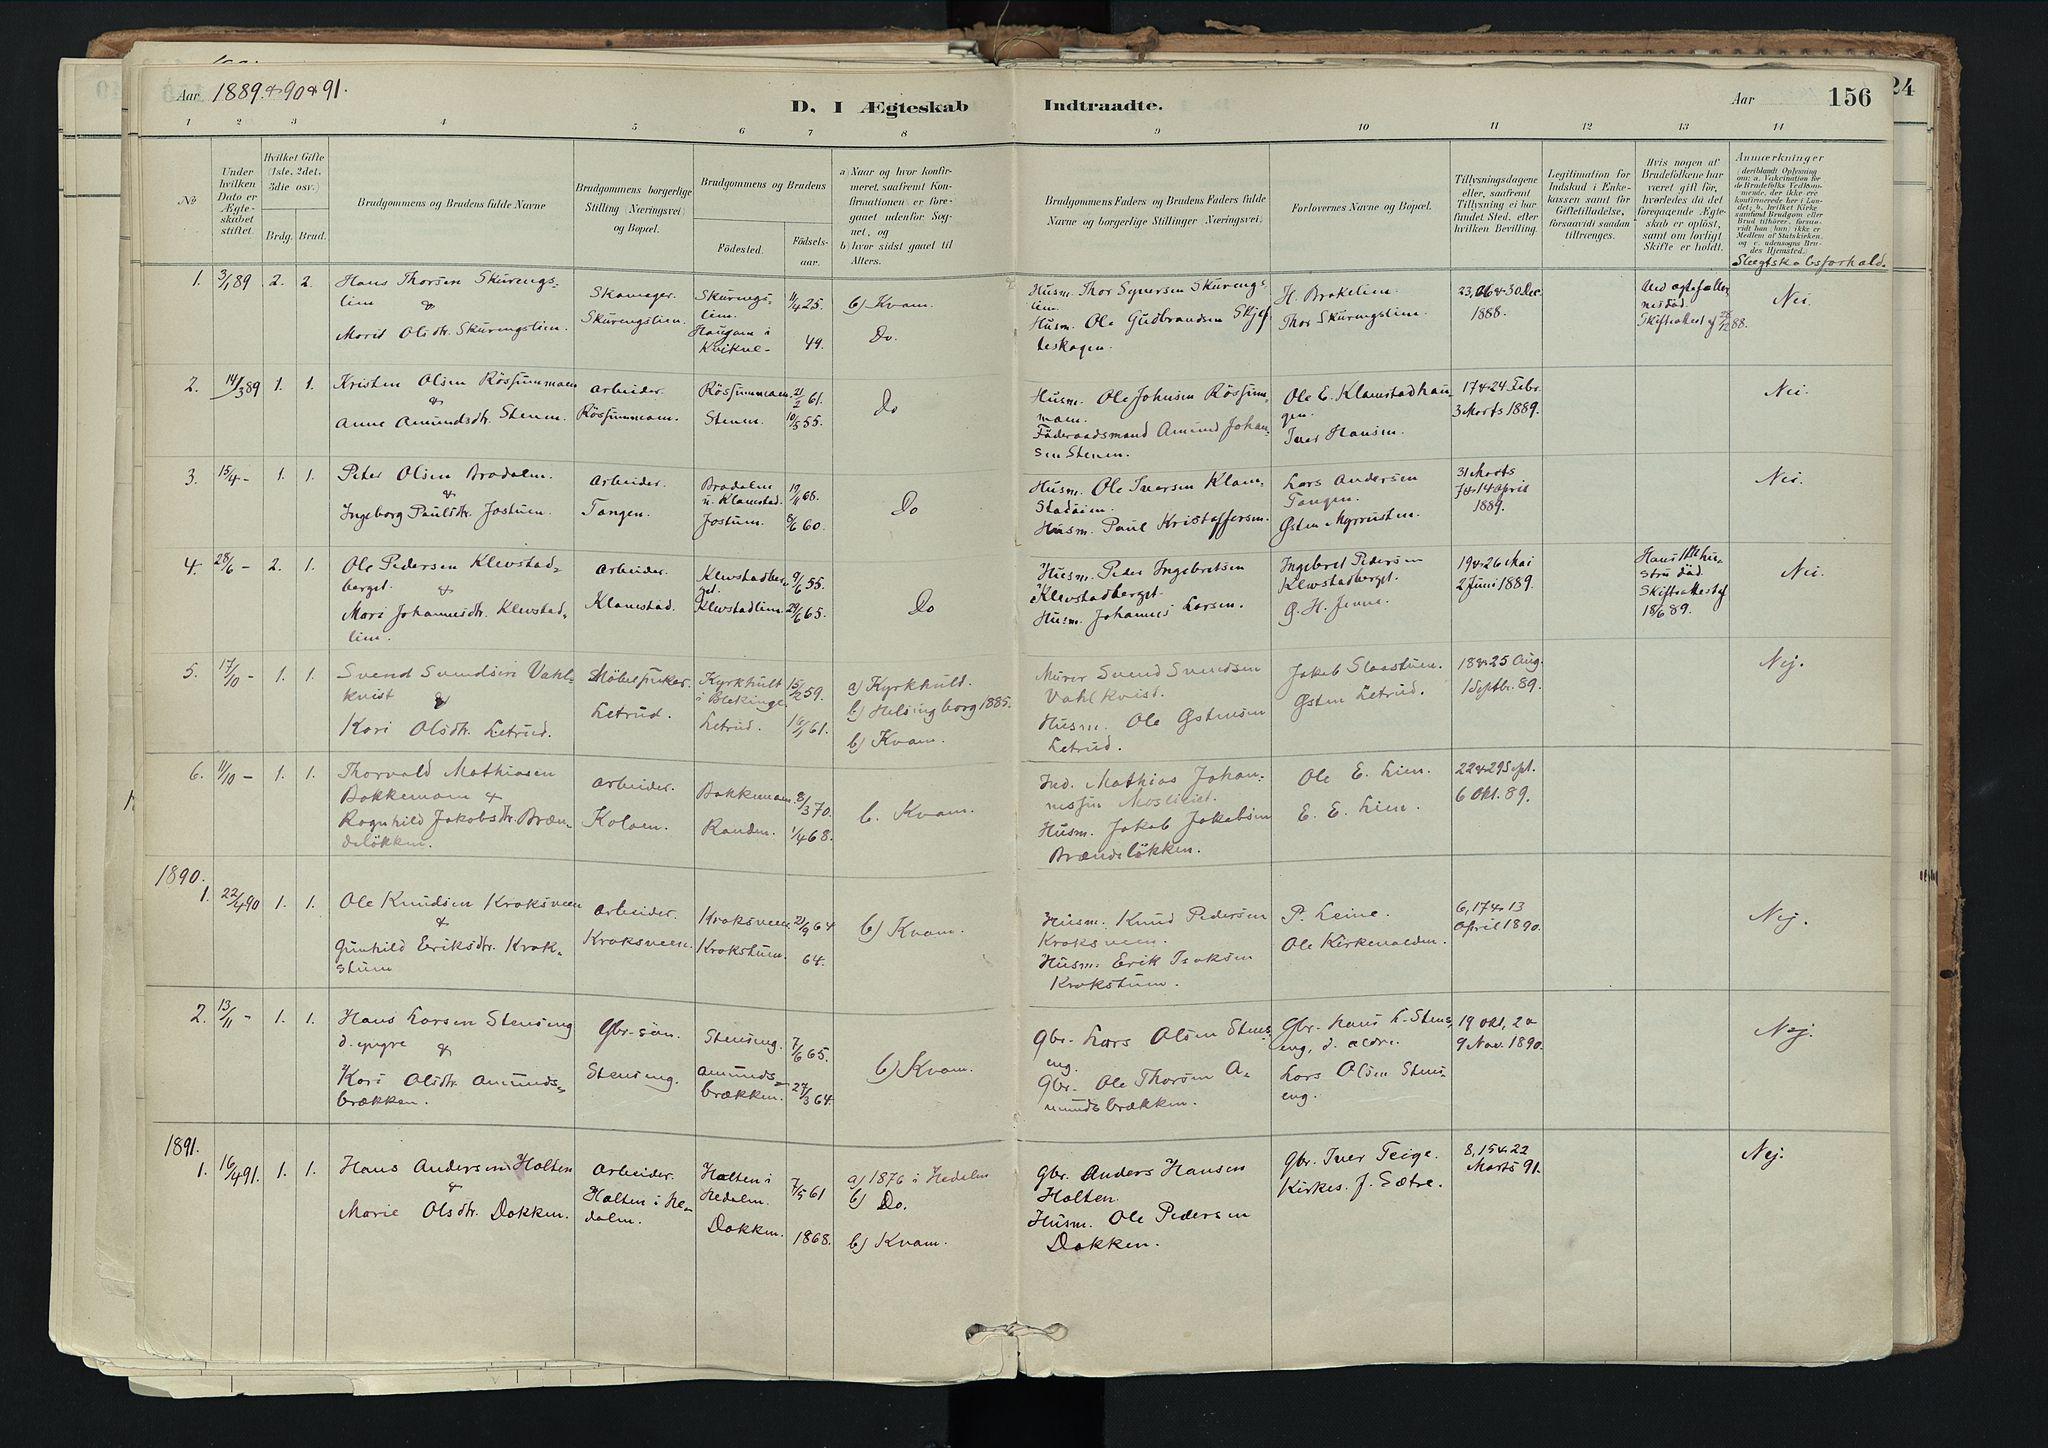 SAH, Nord-Fron prestekontor, Ministerialbok nr. 3, 1884-1914, s. 156